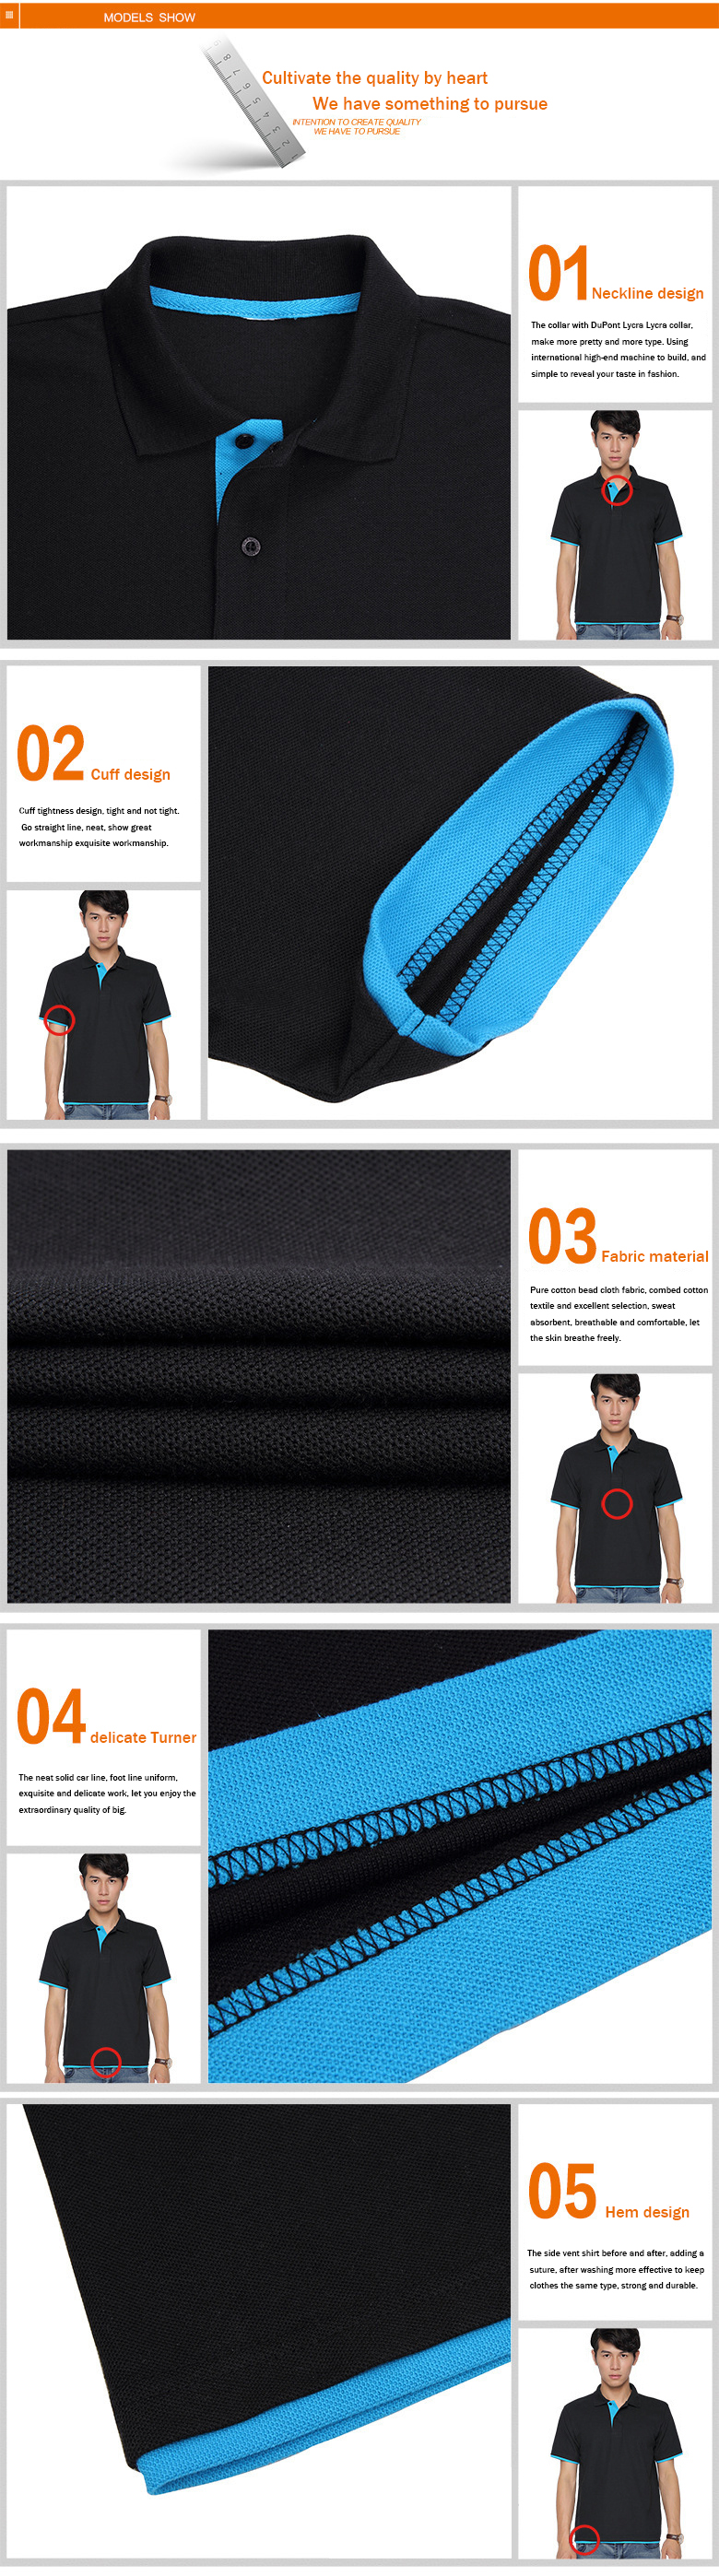 URSPORTTECH Men's Polo Shirt For Men Desiger Polos Men Cotton Short Sleeve shirt Clothes jerseys golftennis Plus Size XS- XXXL 21